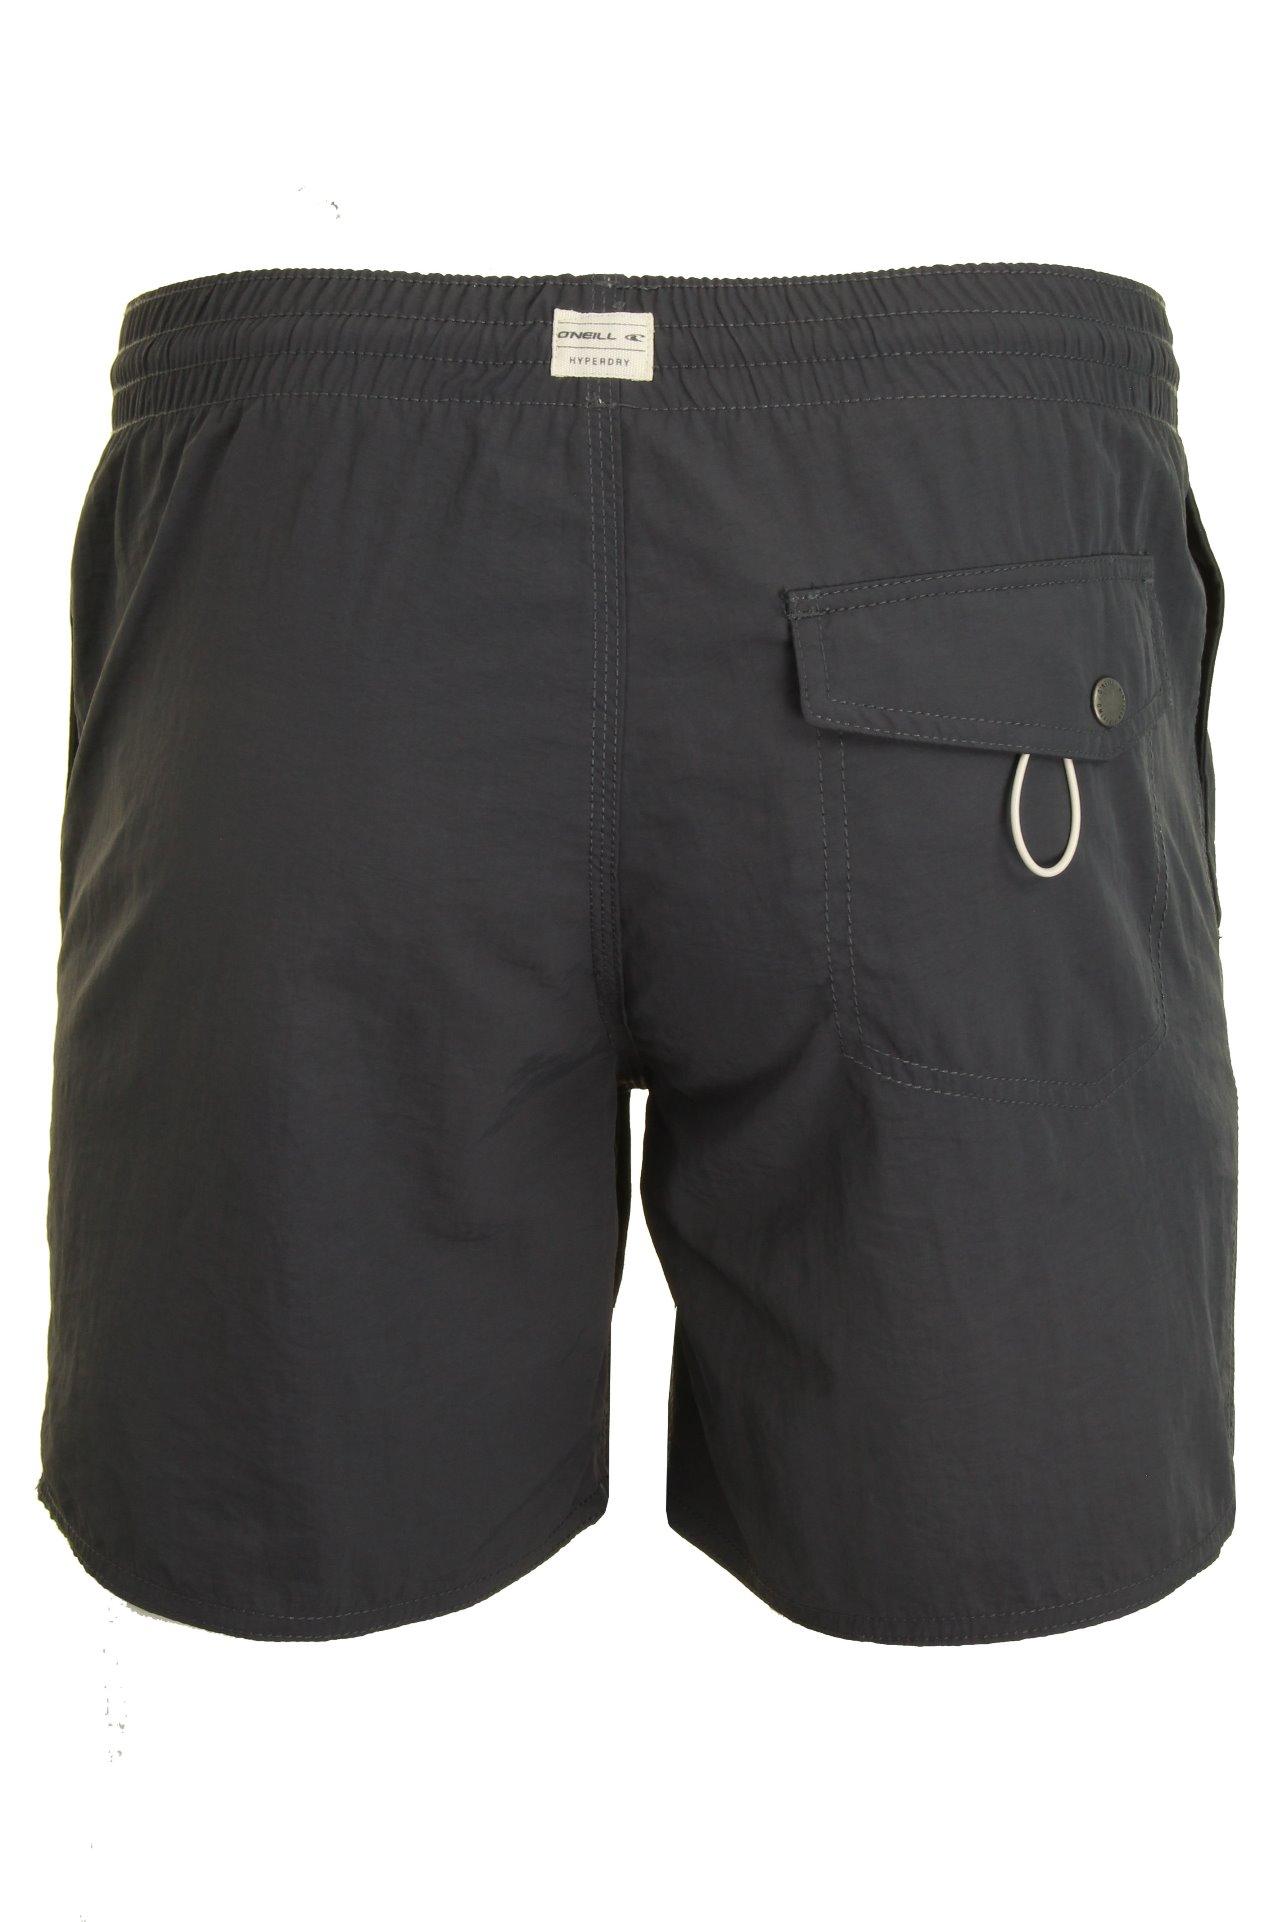 O-039-Neill-Mens-039-Vert-039-Swim-Board-Shorts thumbnail 5